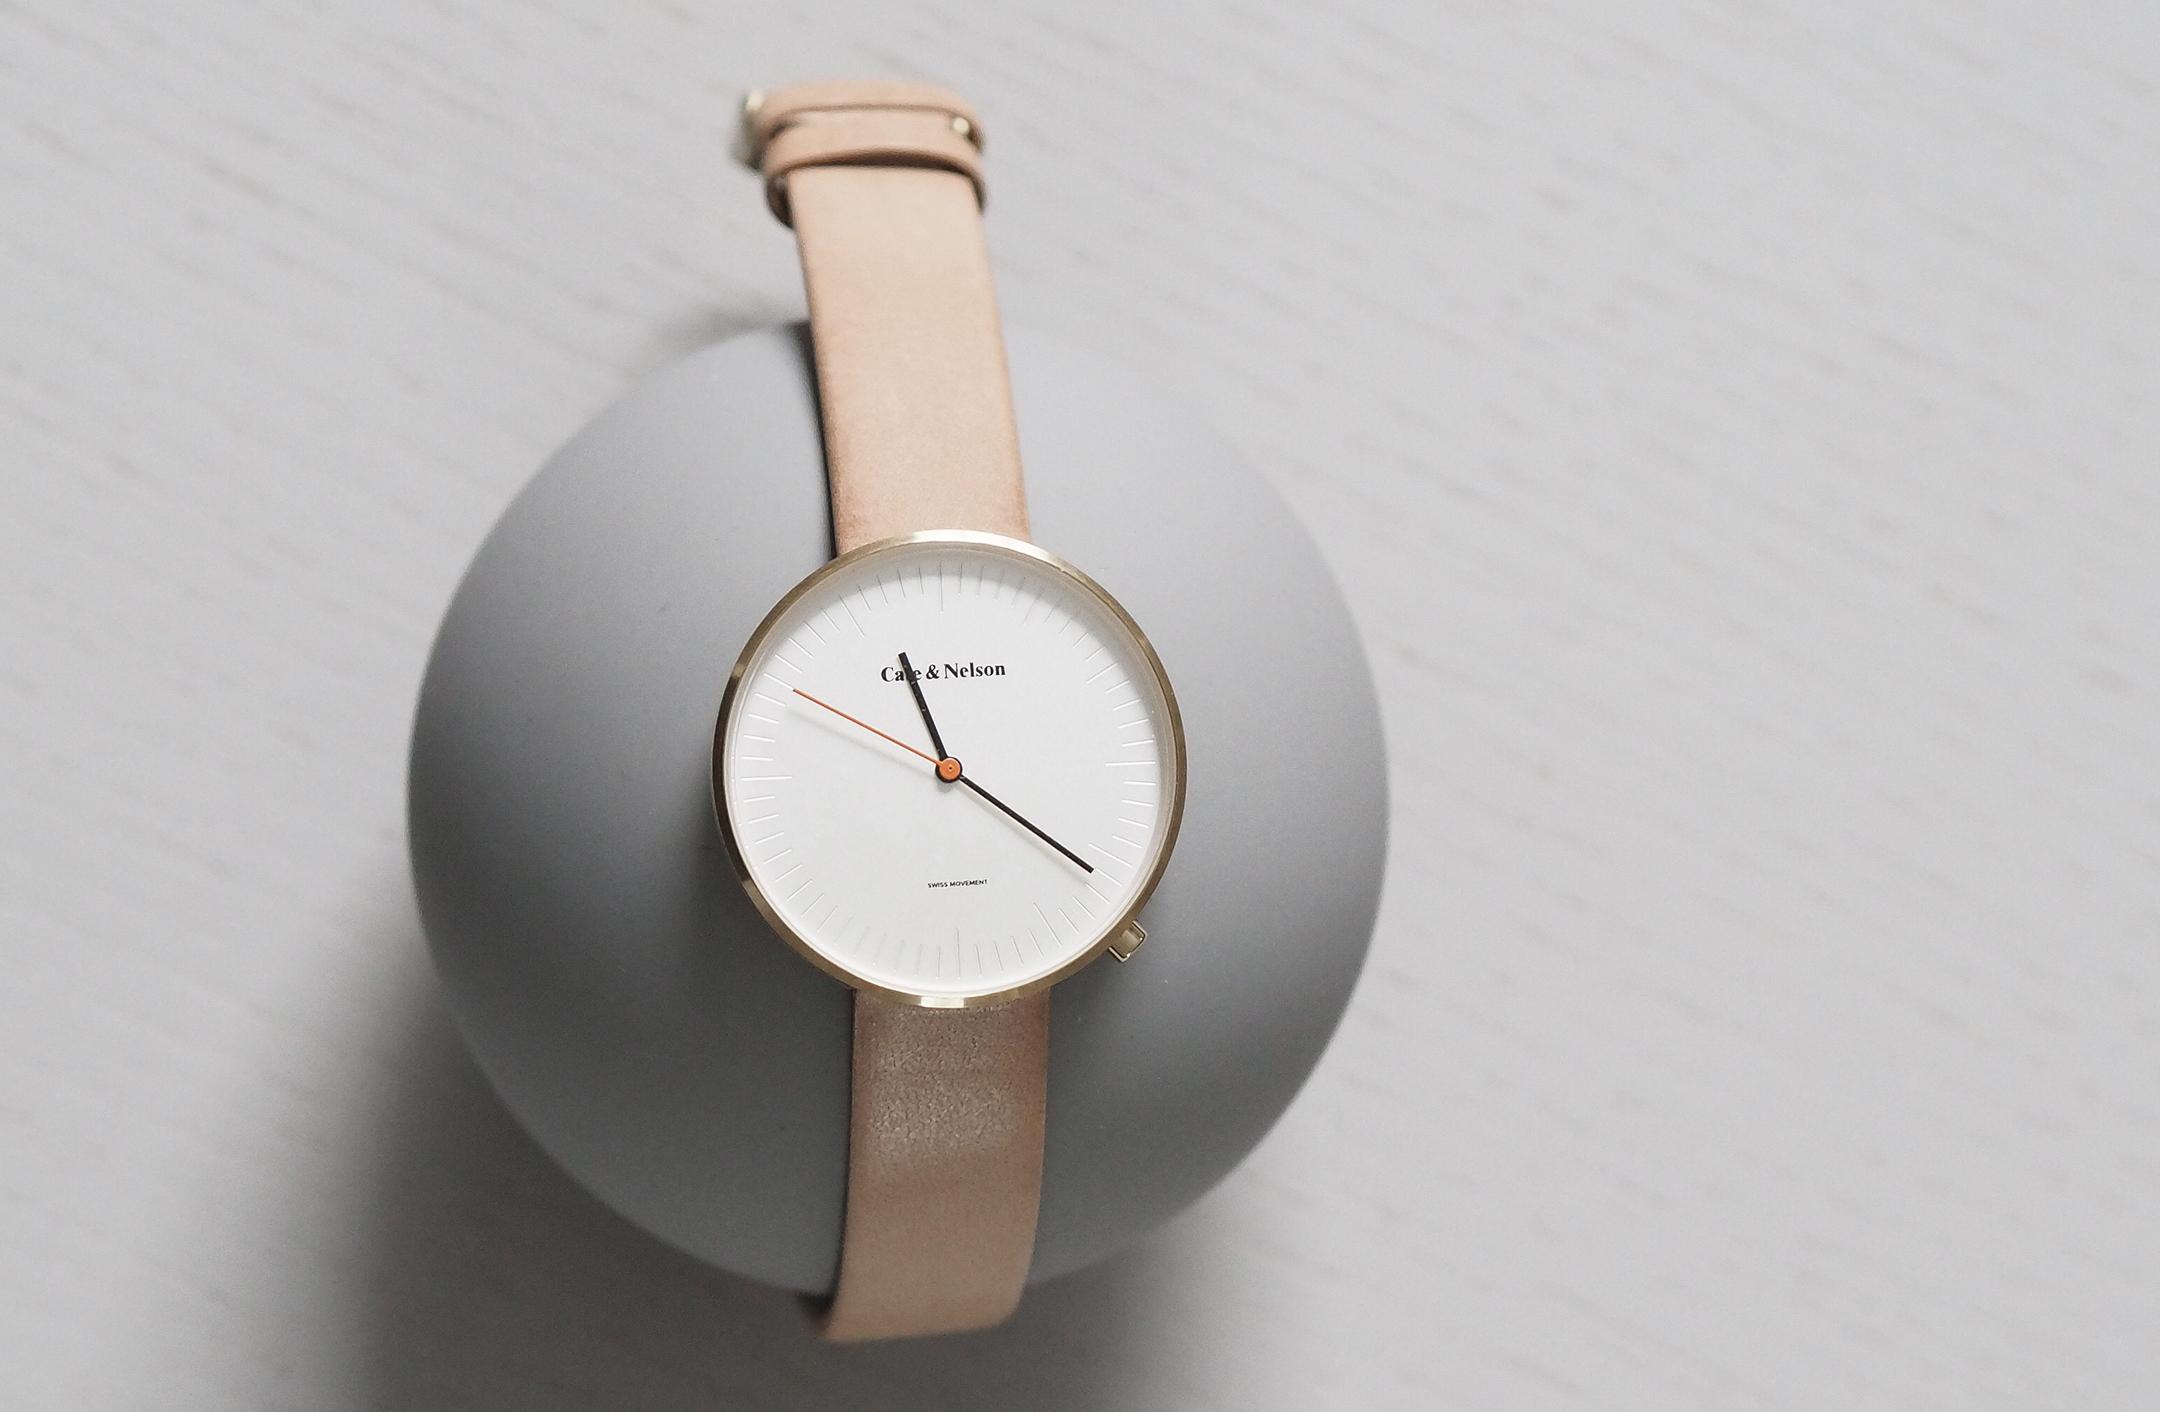 Design Studio Cate amp Nelson Launch Scandinavian Timepieces